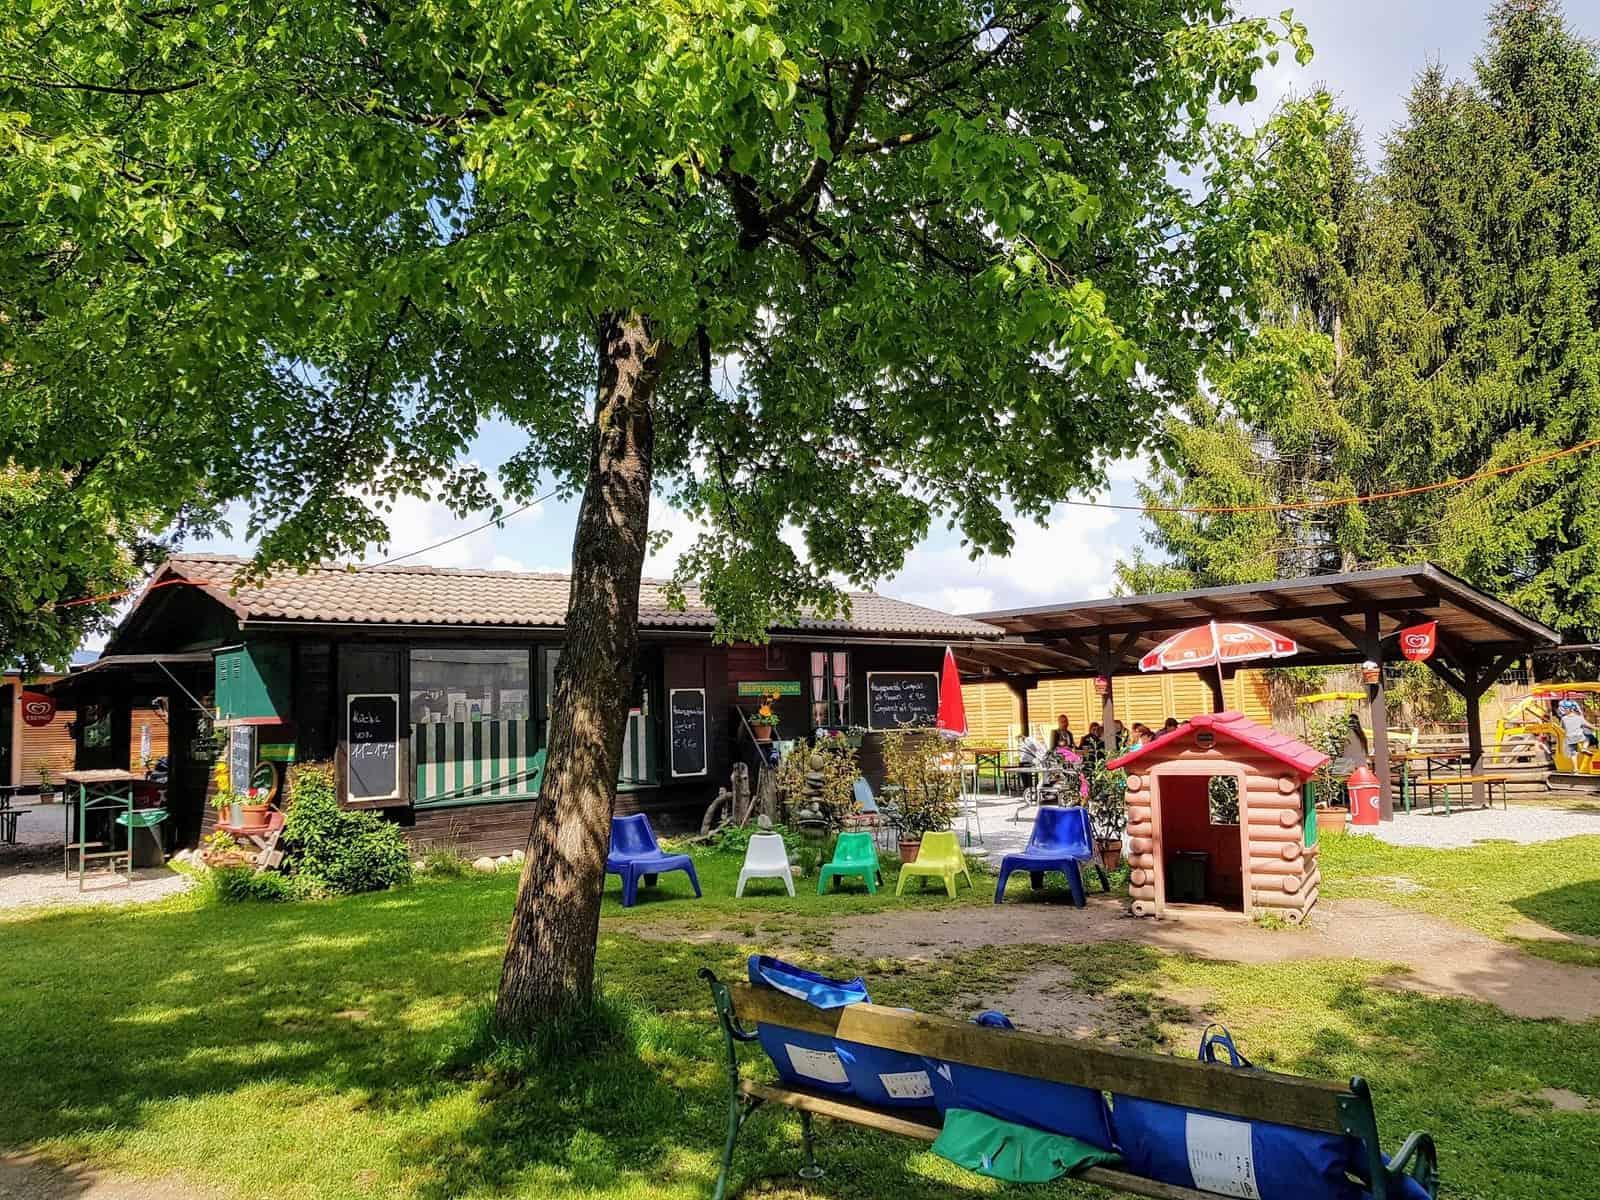 Kinderspielplatz in Kärntens TOP Ausflugsziel Tierpark Rosegg im Rosental Nähe Wörthersee